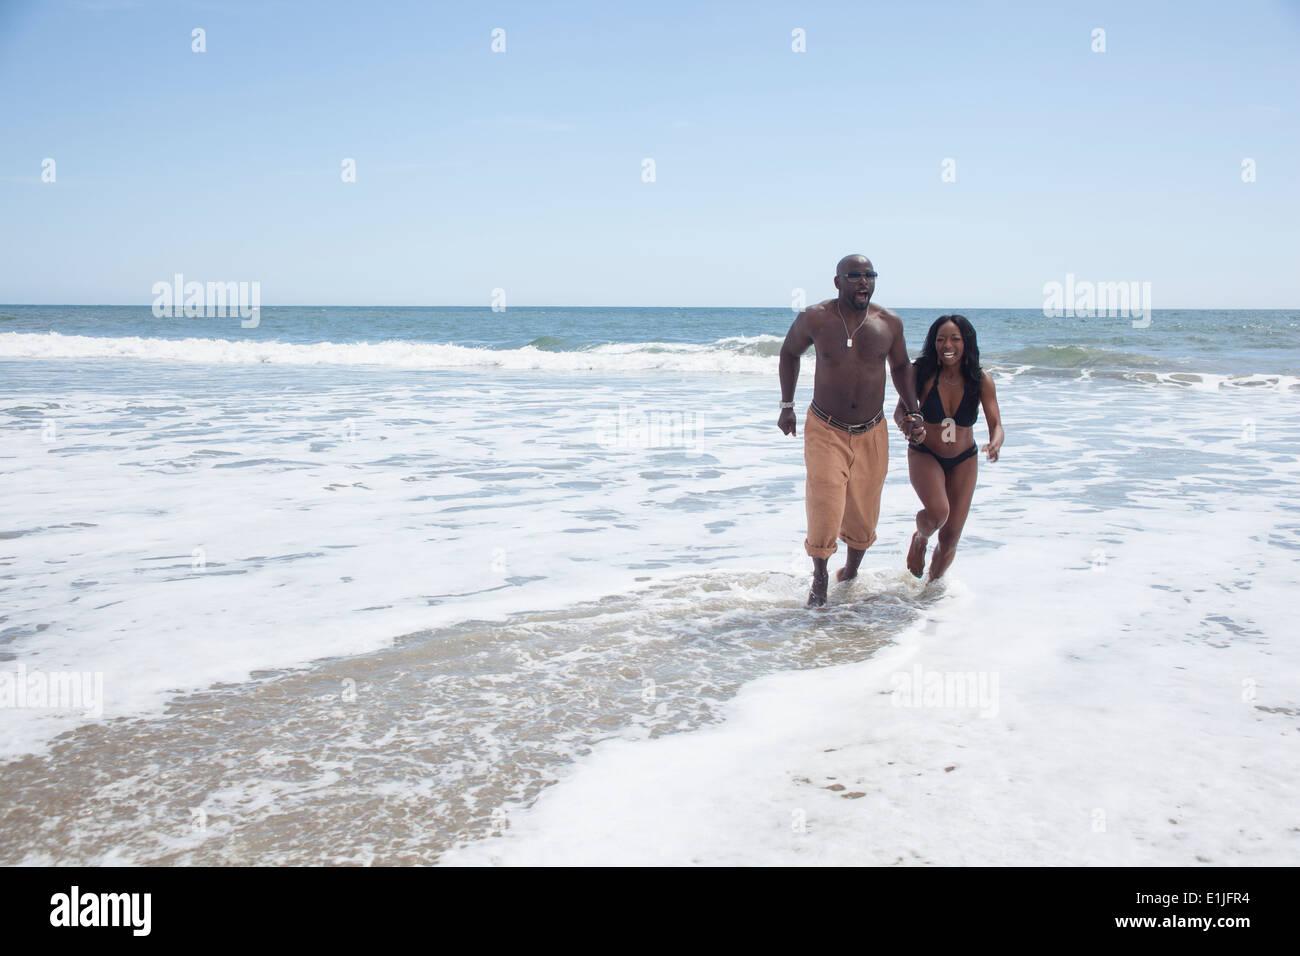 Mature couple walking on beach - Stock Image